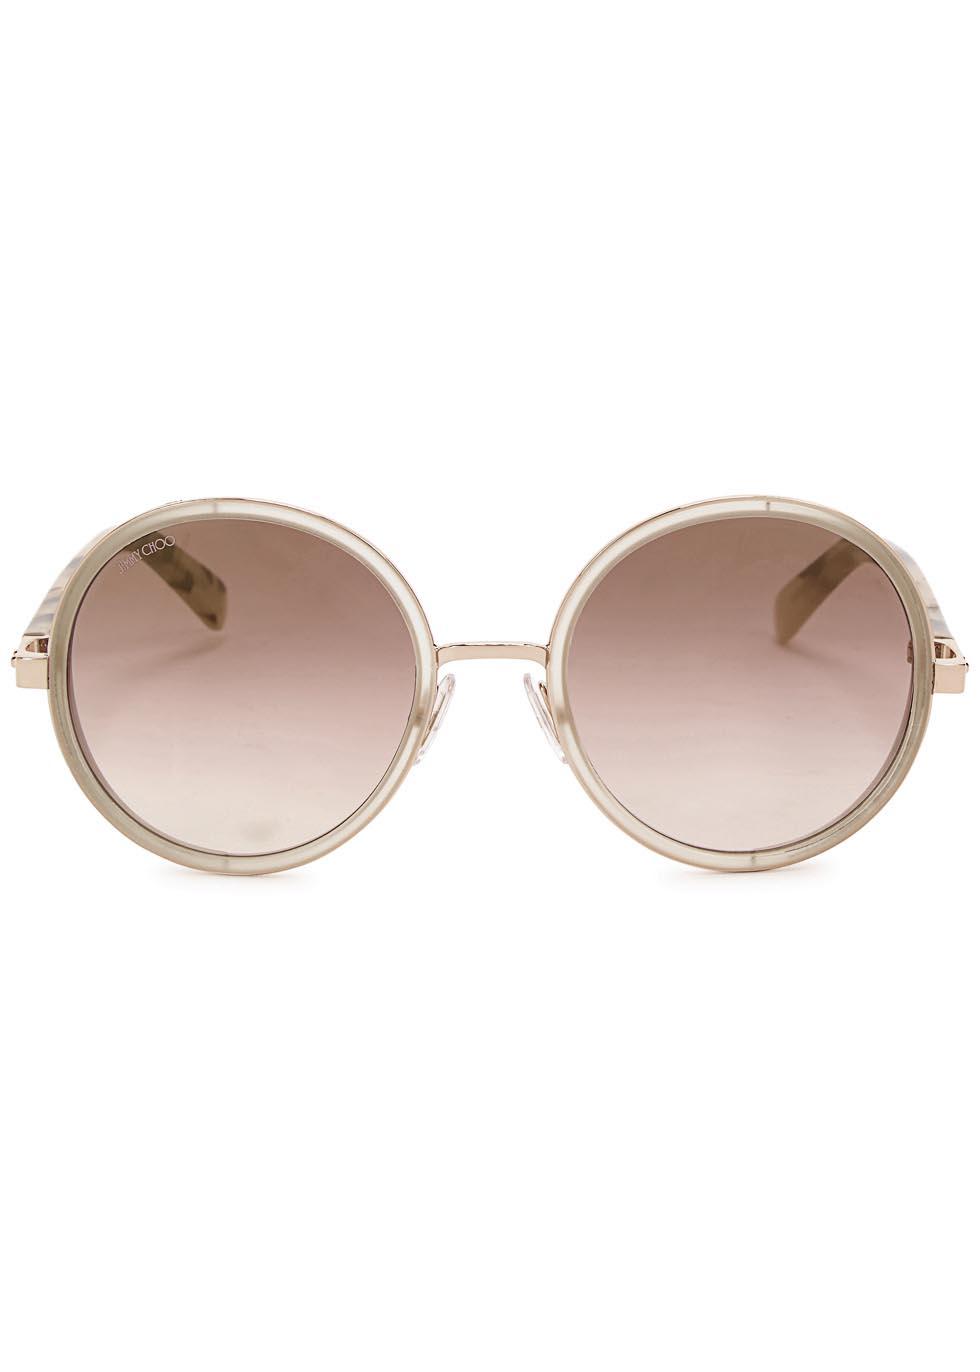 Andie rose gold tone mirrored sunglasses - Jimmy Choo